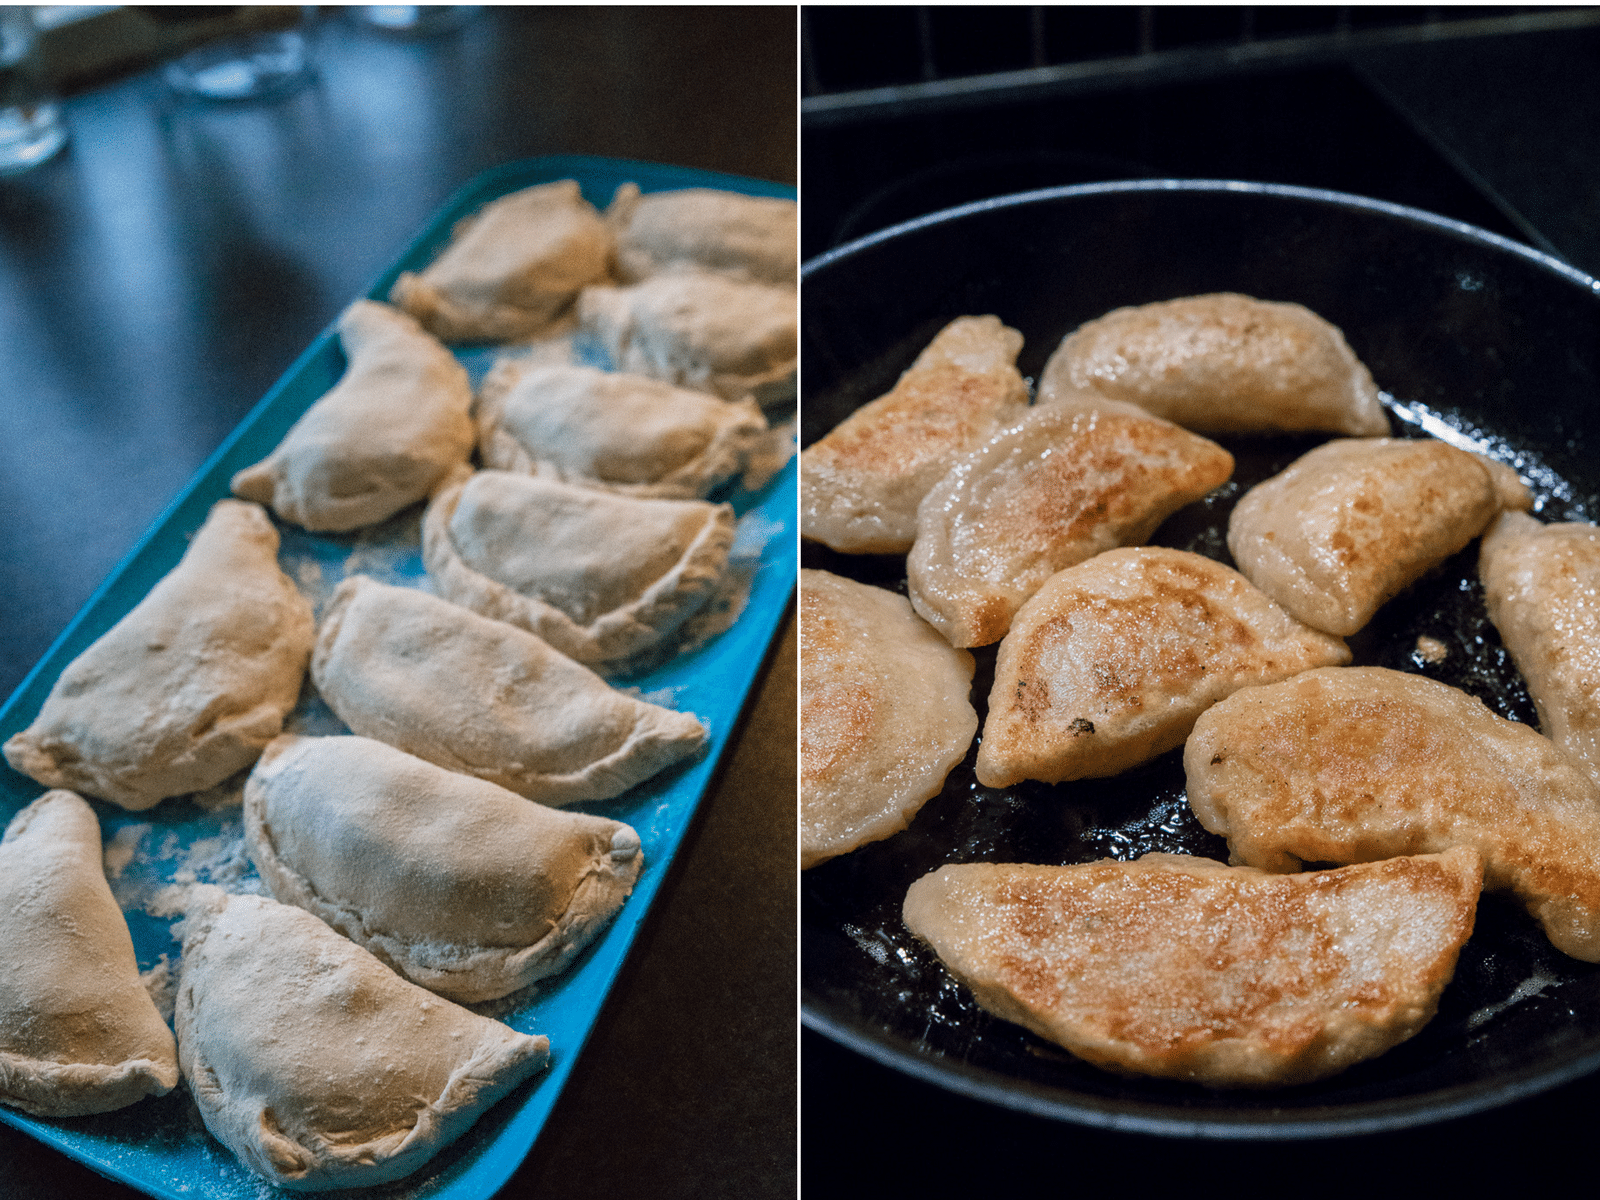 russiske vareniki, fryseegnet mad, ristede løg, karfoffelmos